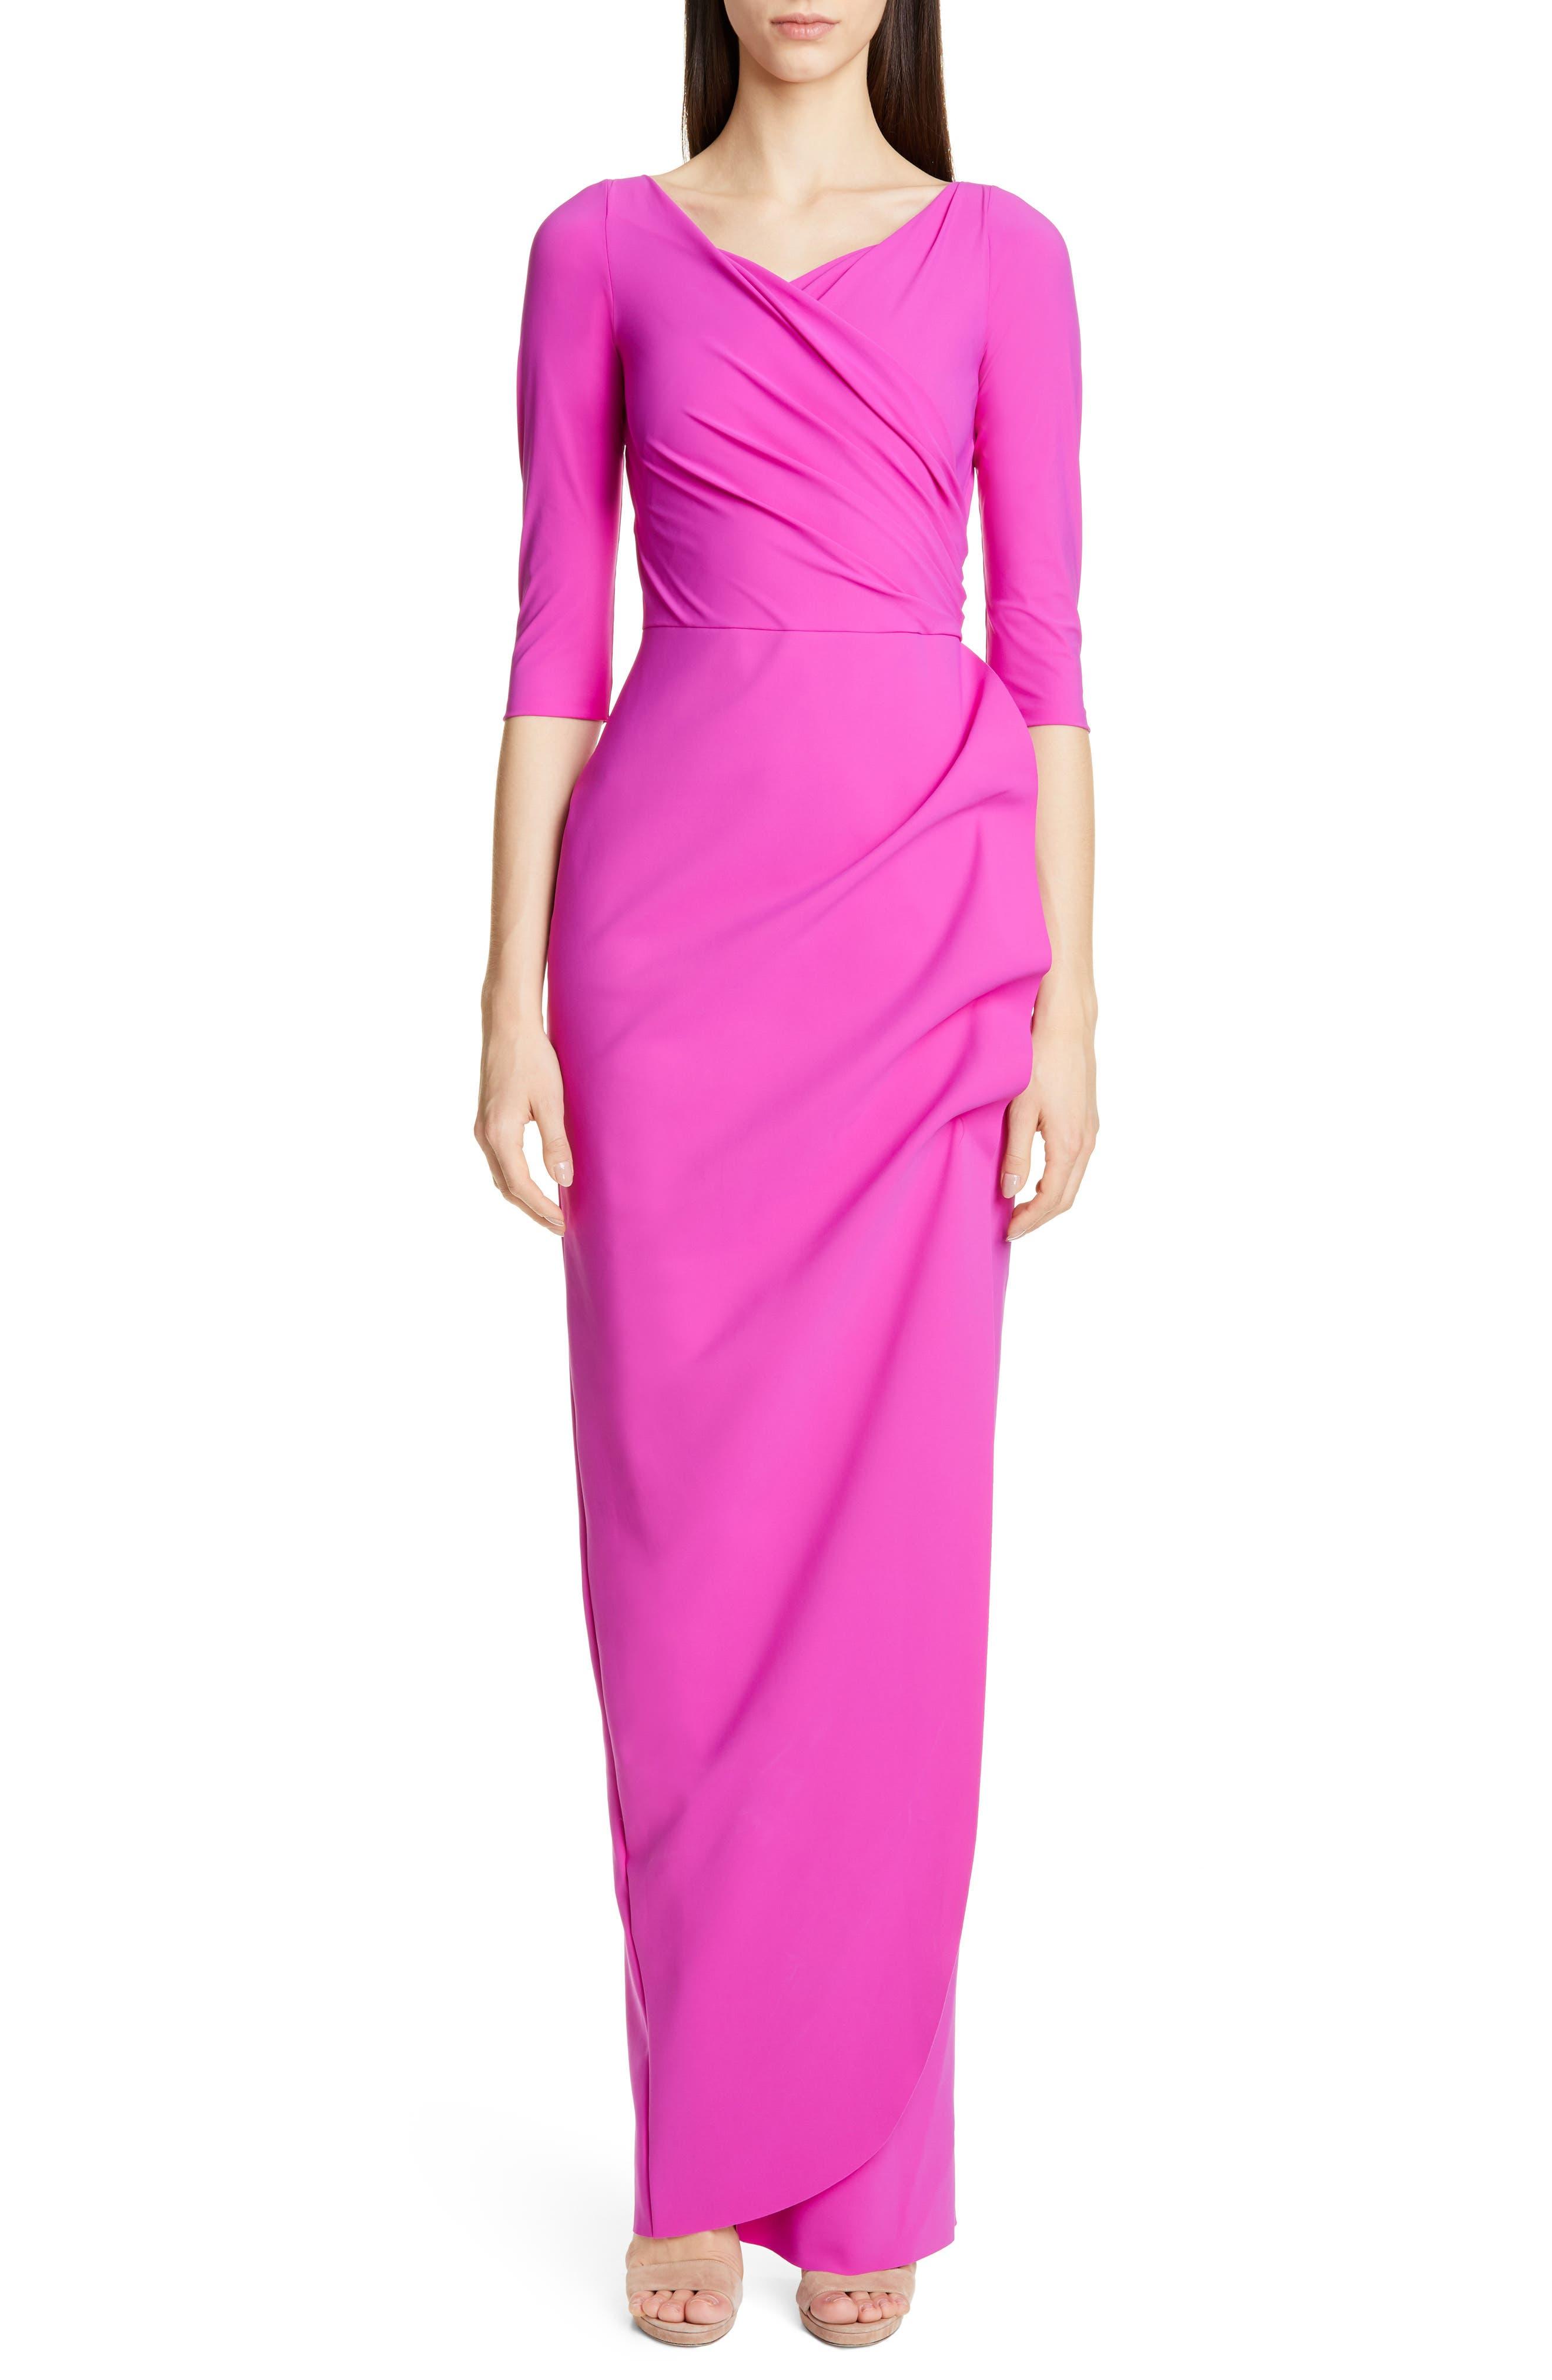 Chiara Boni La Petite Robe Florien Ruched Evening Dress, US / 42 IT - Pink